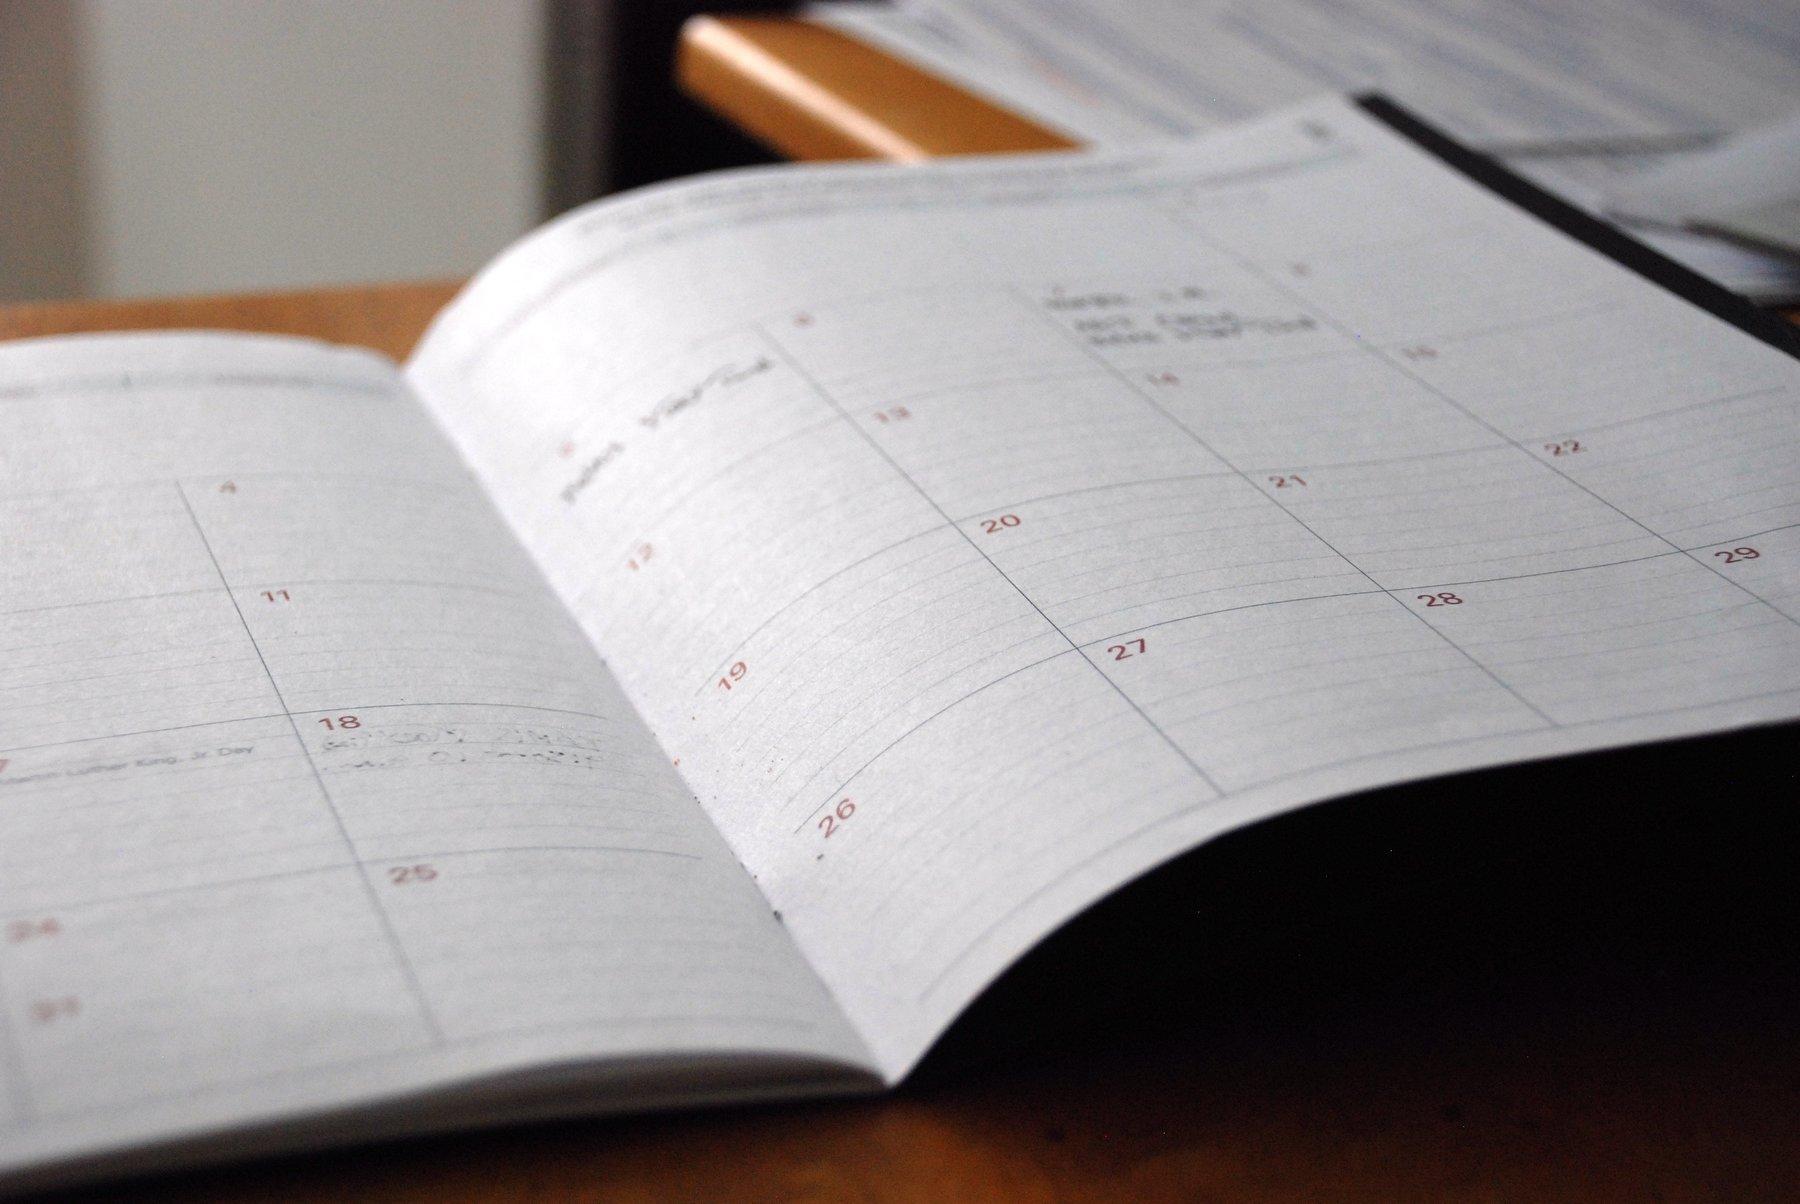 Agenda Sight coaching